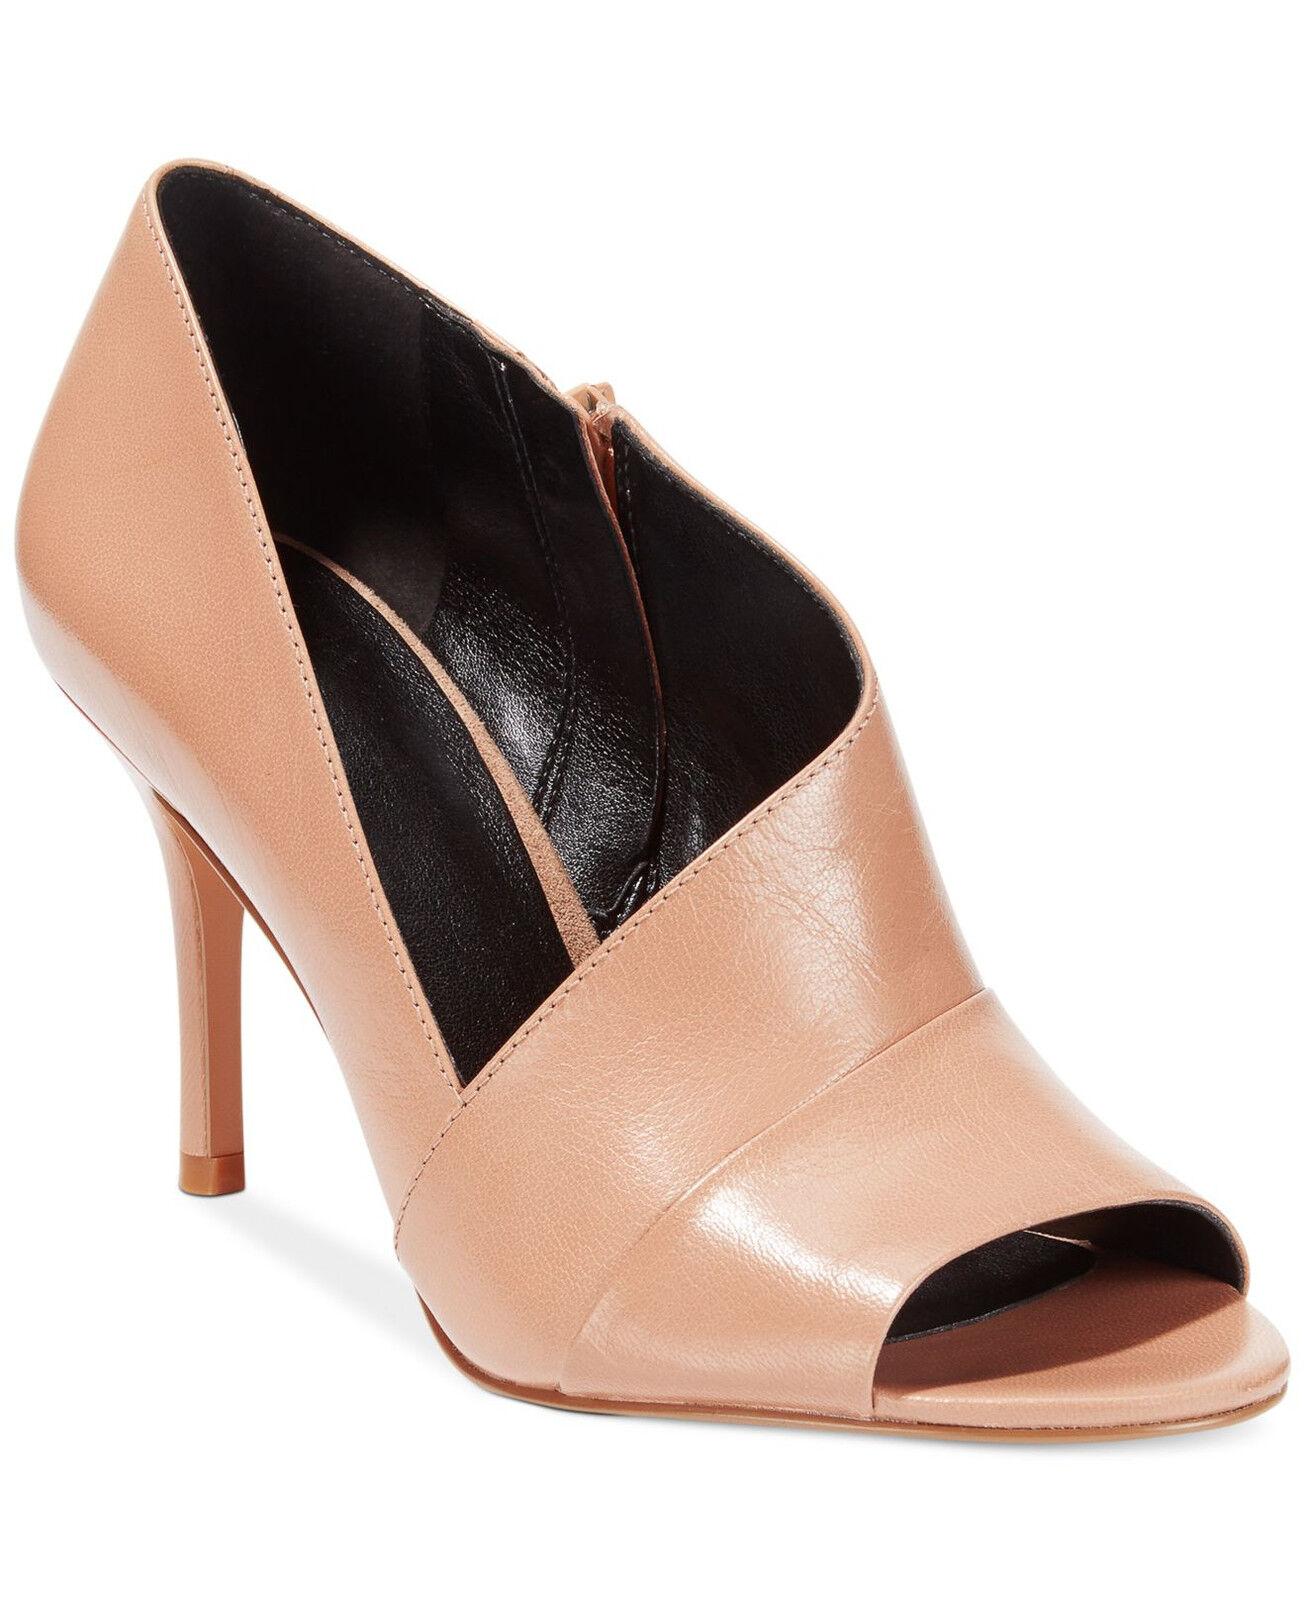 New nine west sz 12 glara taupe leather peeptoe shootie Bootie pump heel